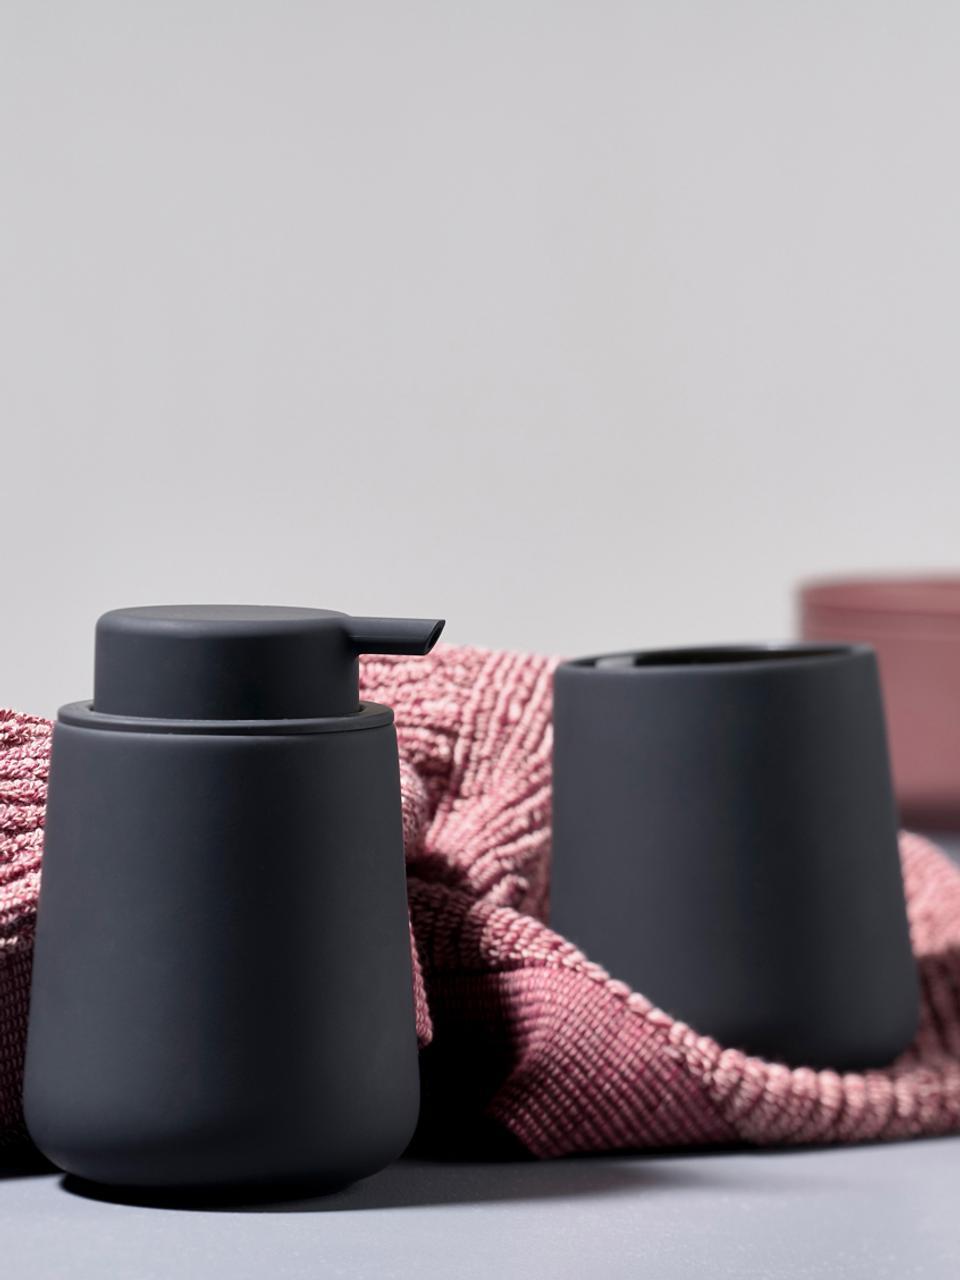 Dosificador de jabón Nova One, Recipiente: porcelana, Dosificador: plástico, Negro, Ø 8 x Al 12 cm